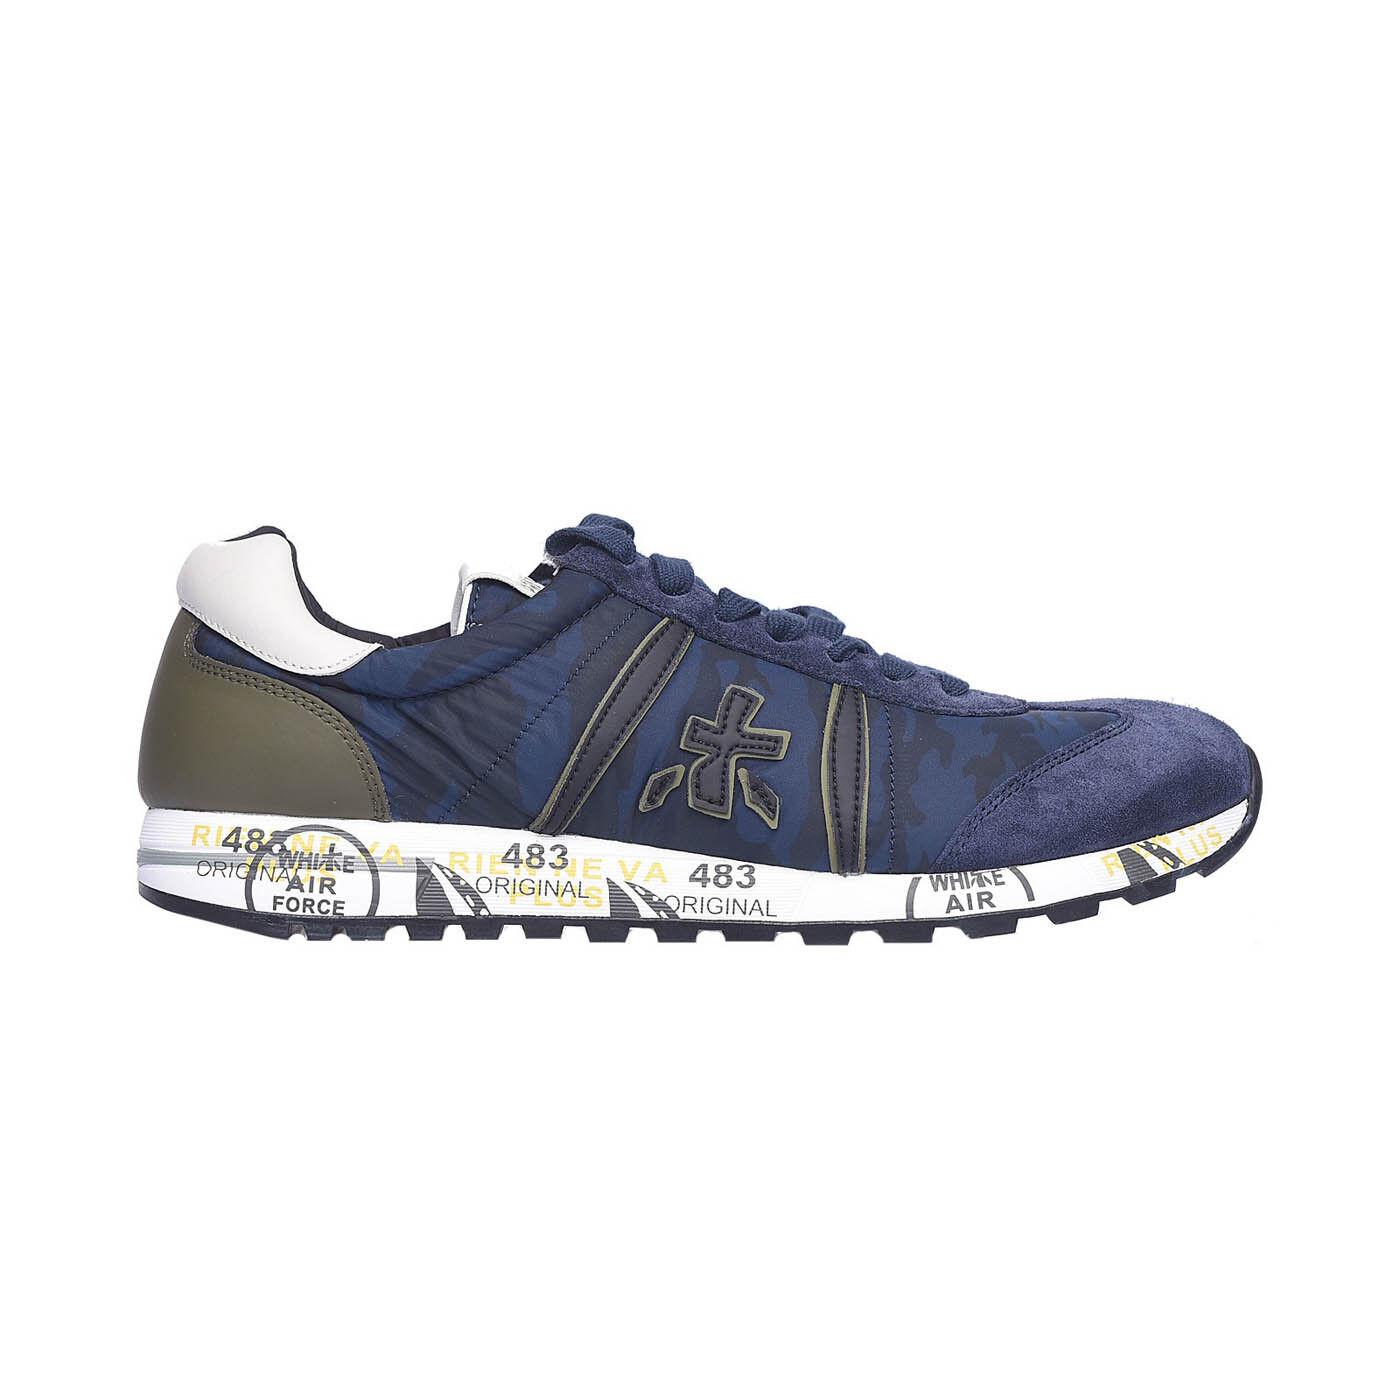 Premiata Lucy 2460 Leather - Fabric Italian Sneakers bluee Camo